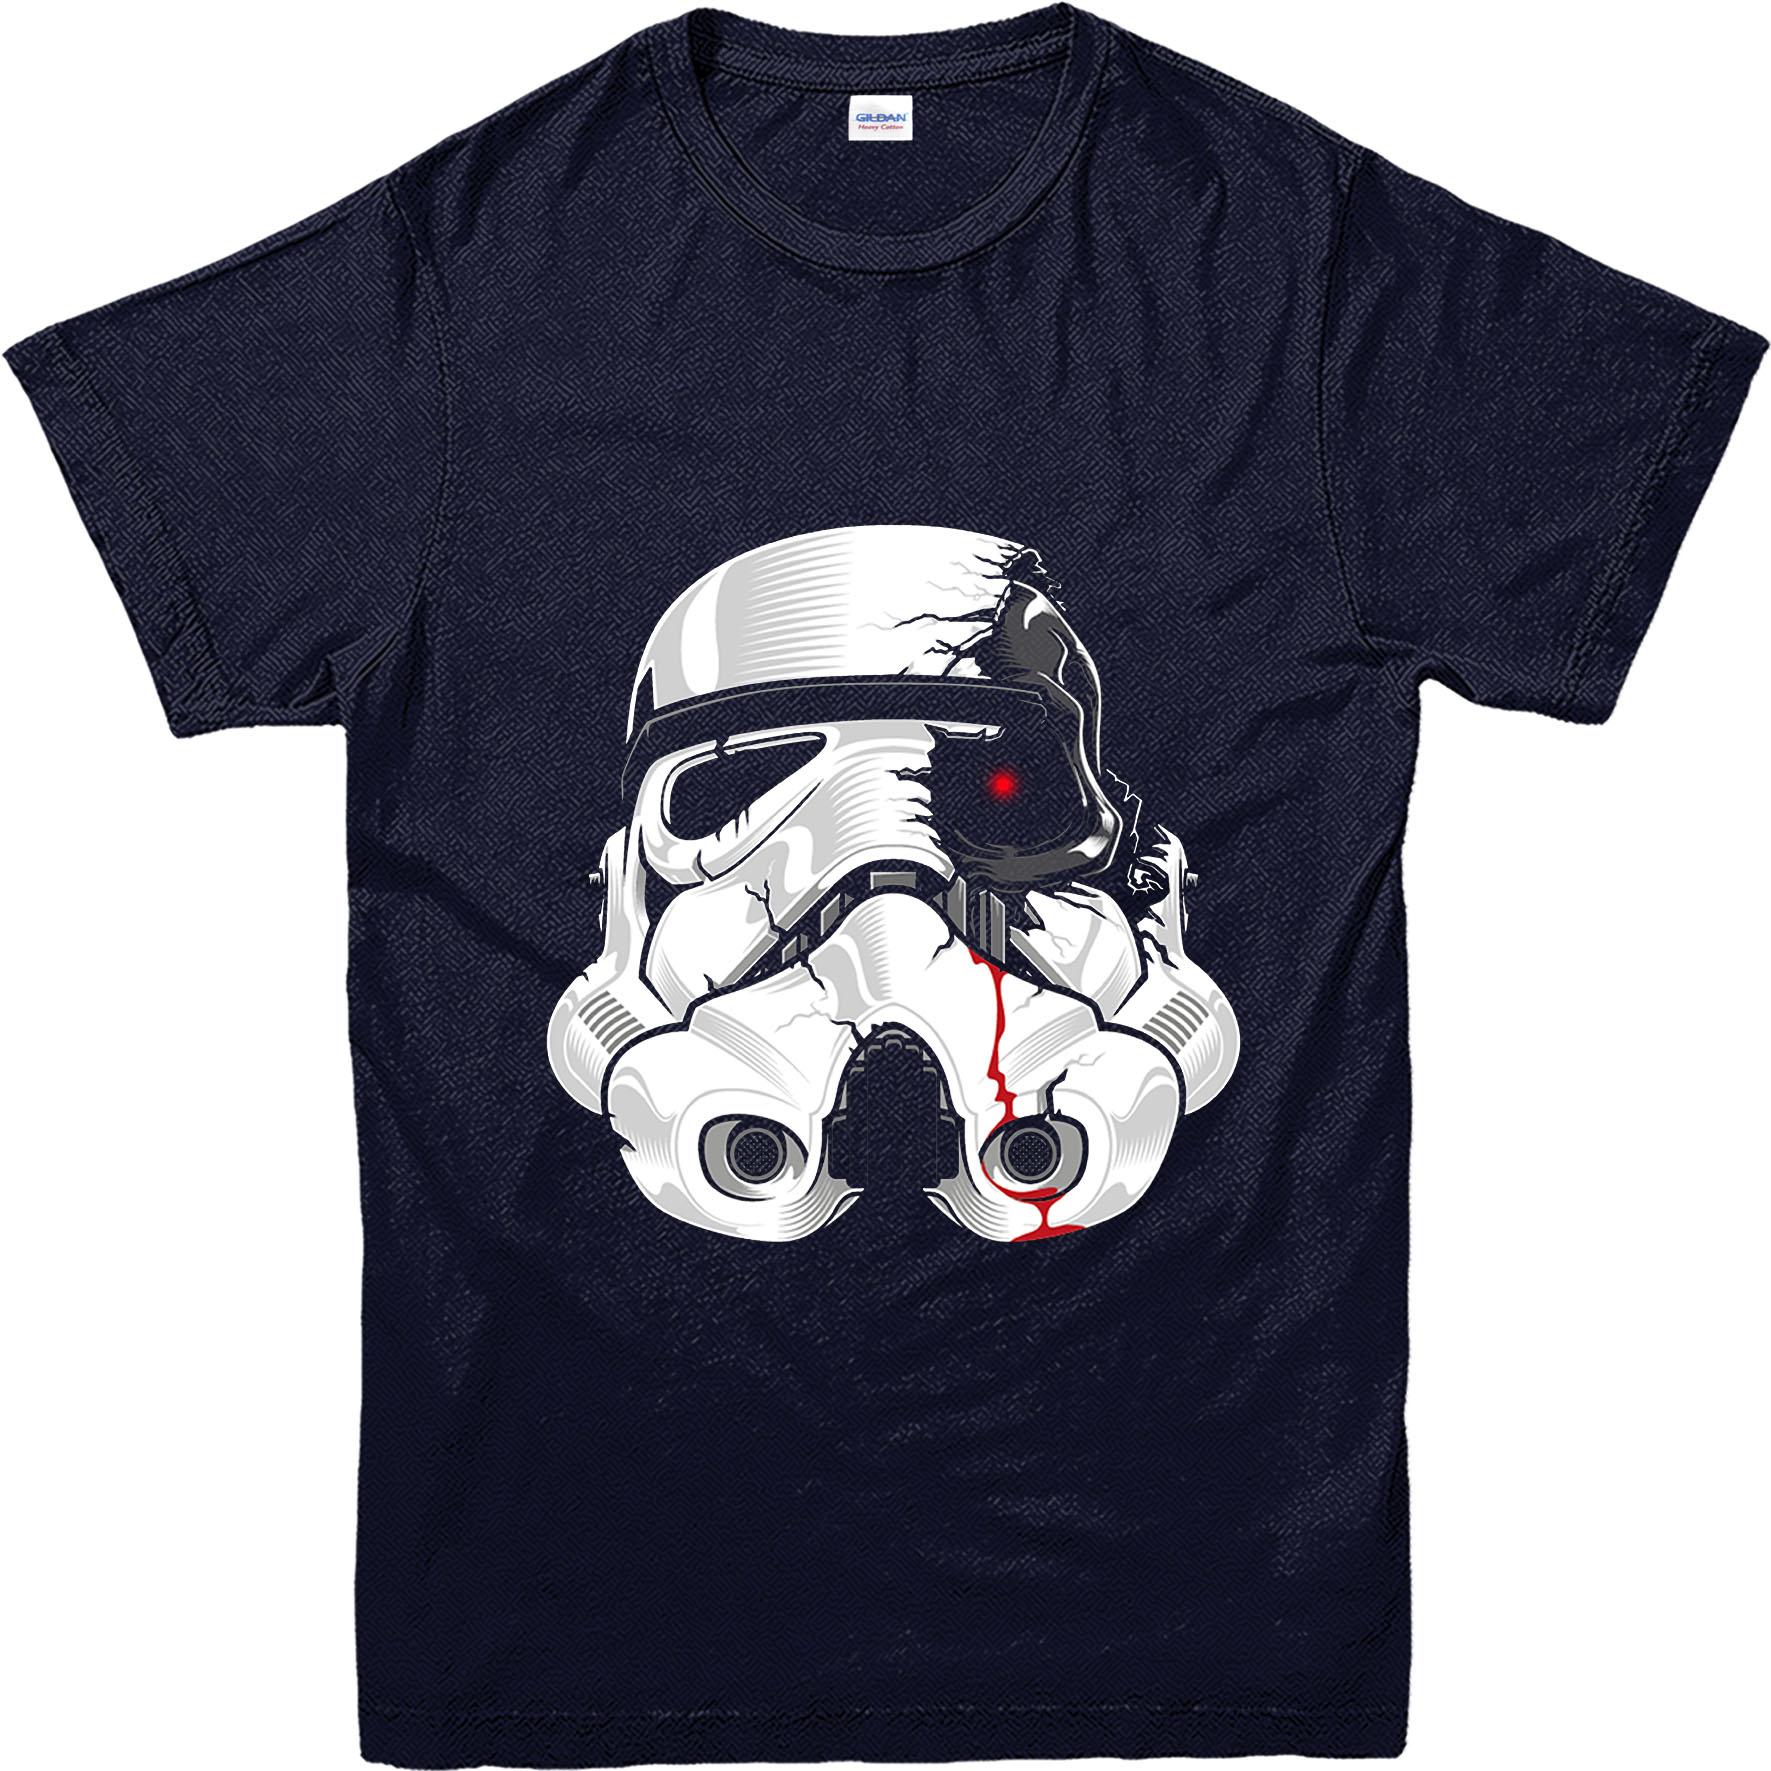 star wars t shirt stormtrooper terminator spoof inspired design top swtms ebay. Black Bedroom Furniture Sets. Home Design Ideas